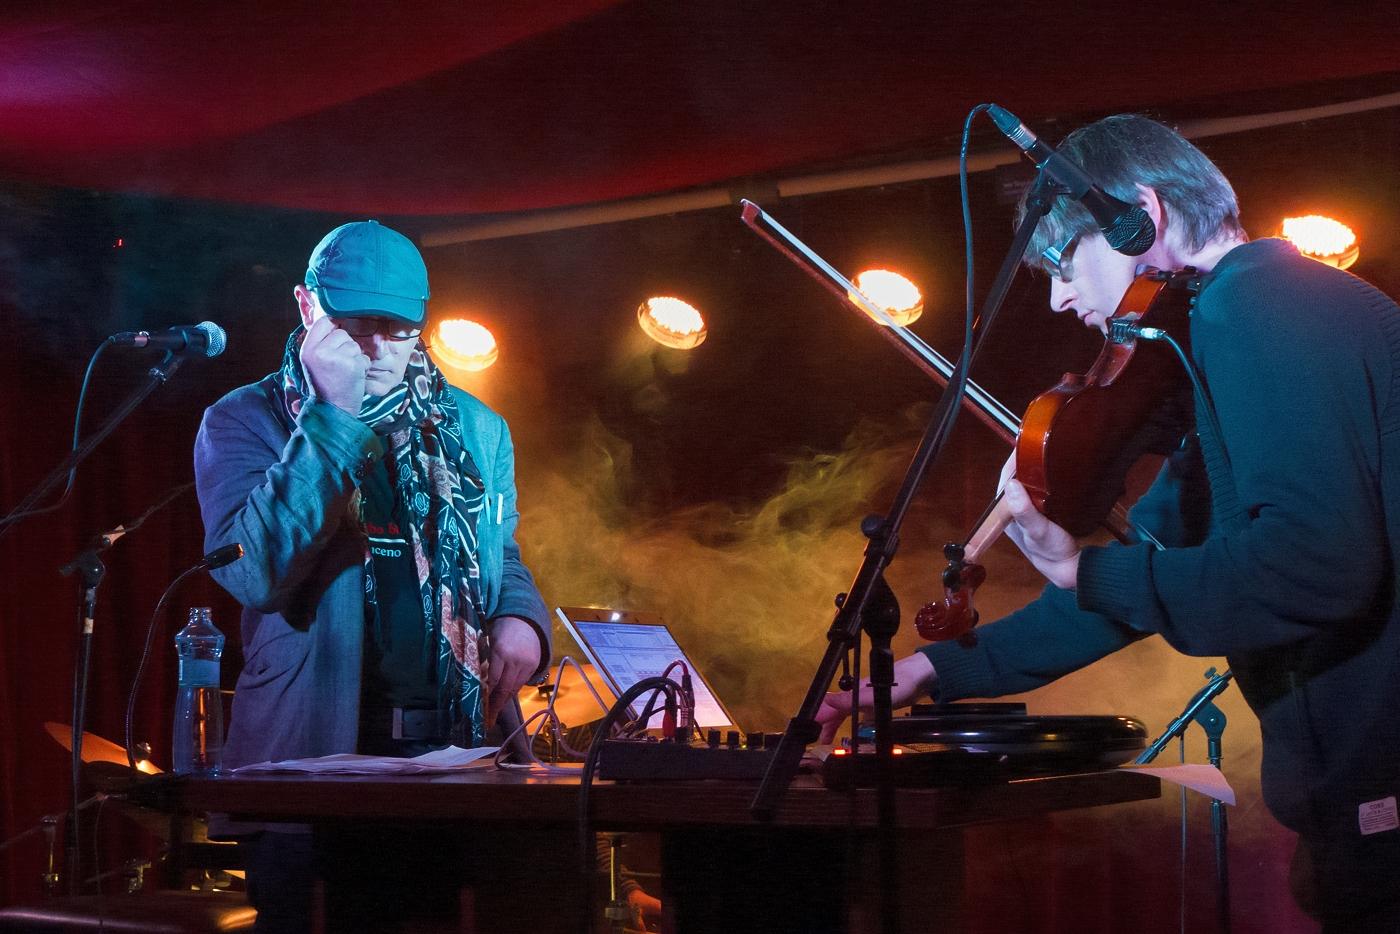 DG 307 concert in Klub77, Leica Dlux-6